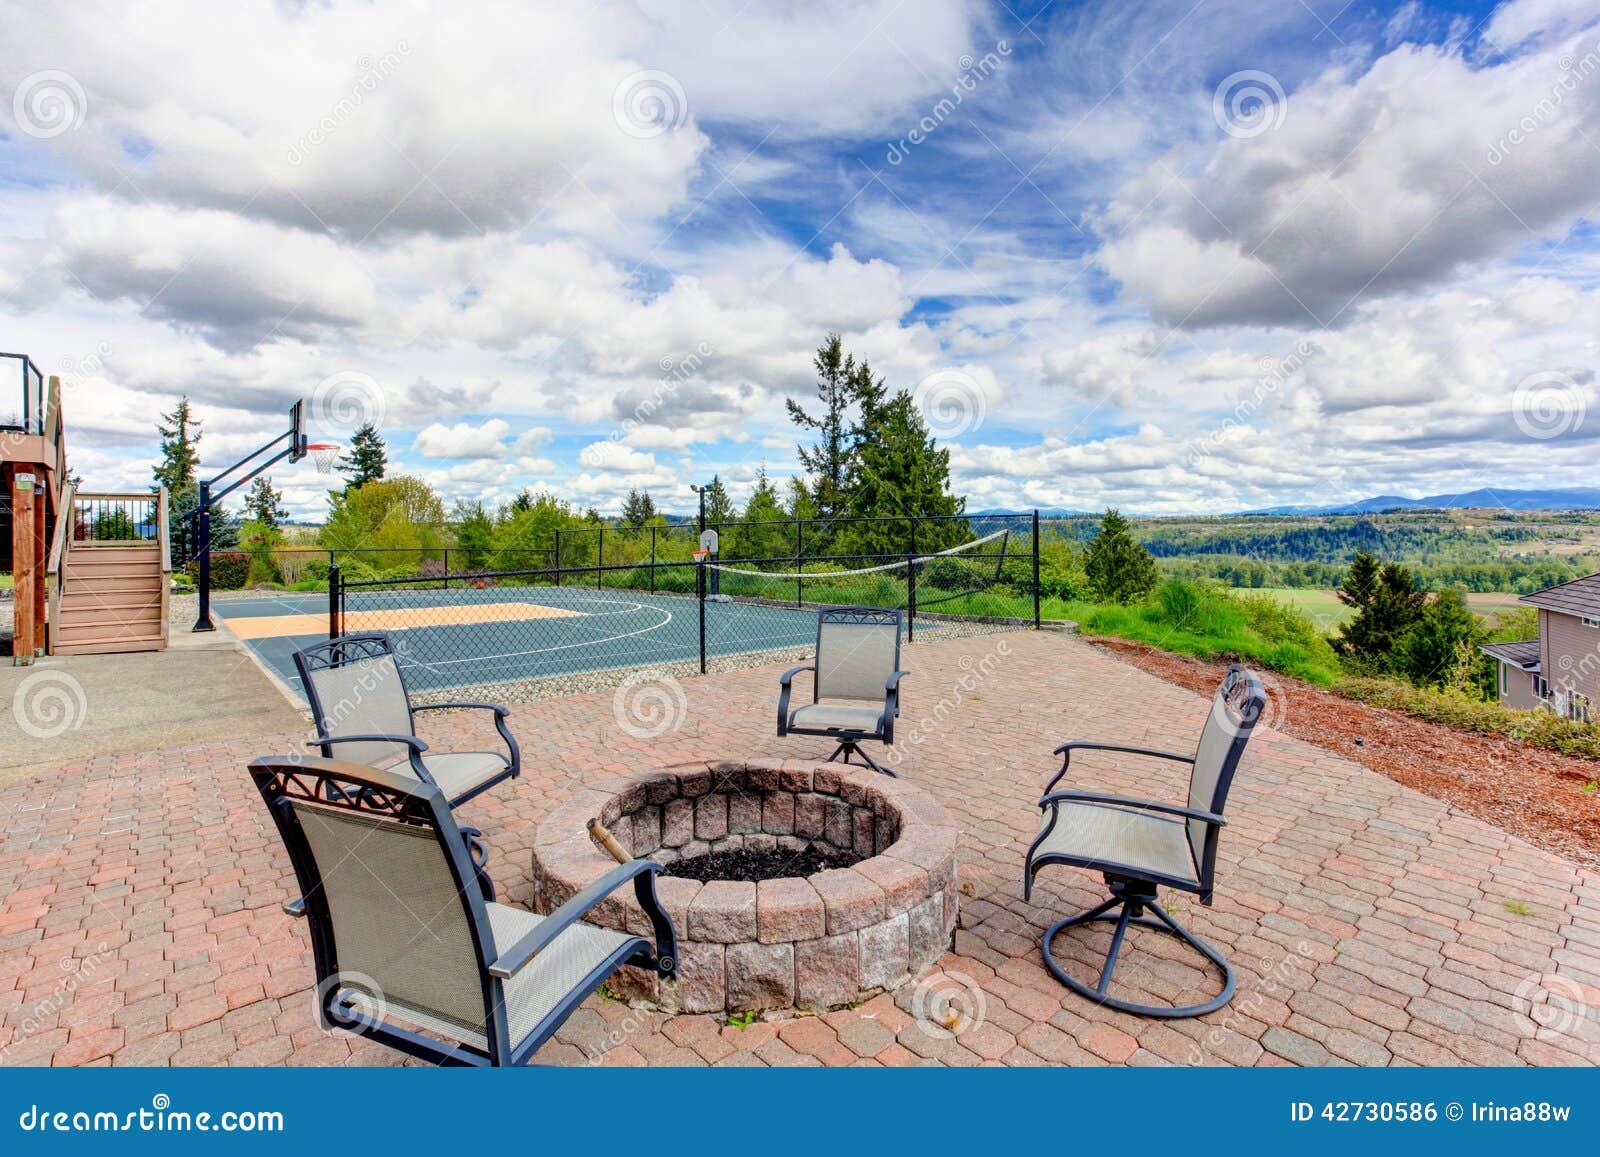 backyard patio area with basketball court stock photo image